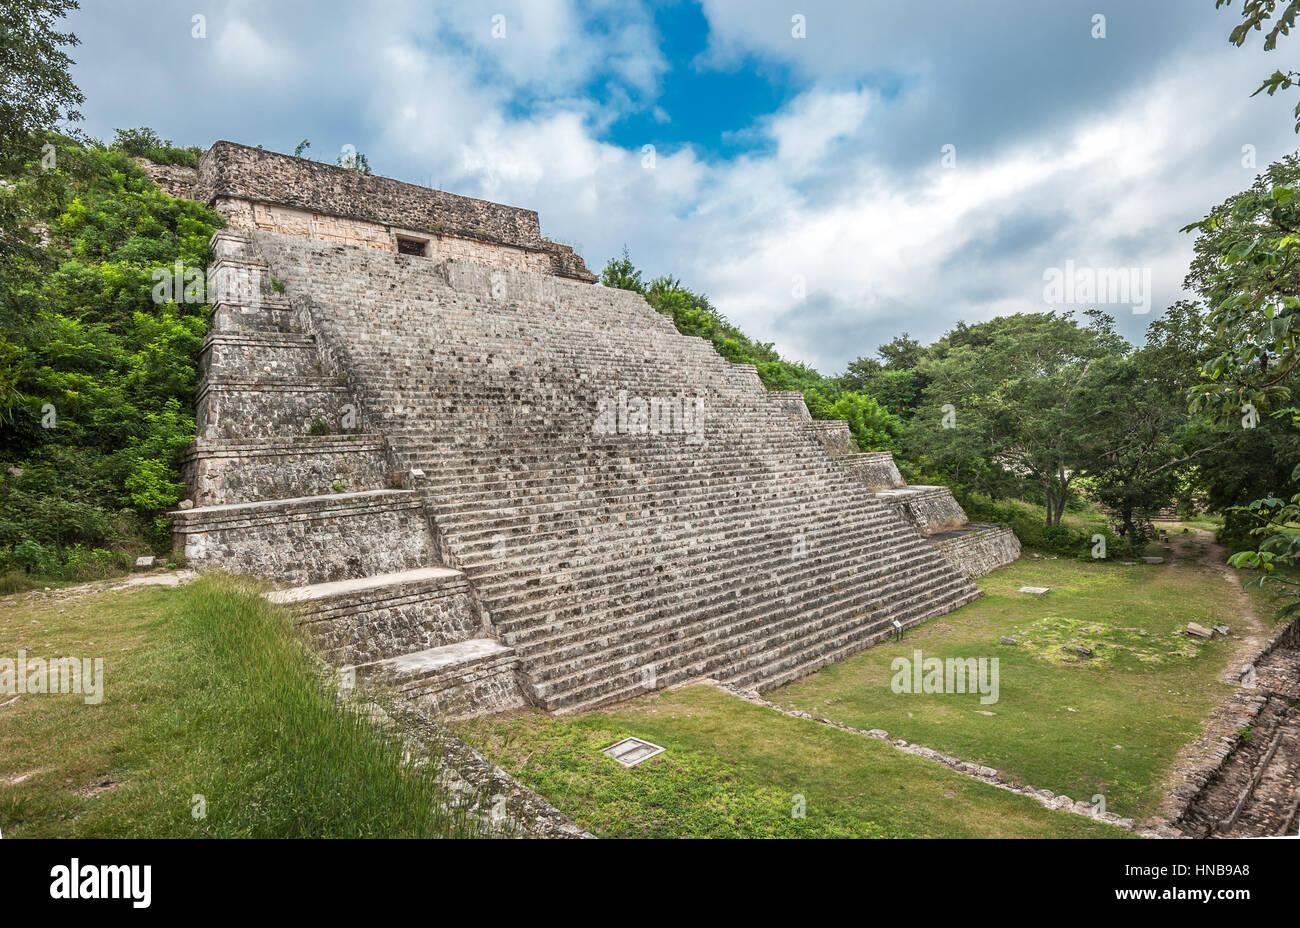 The great pyramid in Uxmal, Yucatan, Mexico - Stock Image